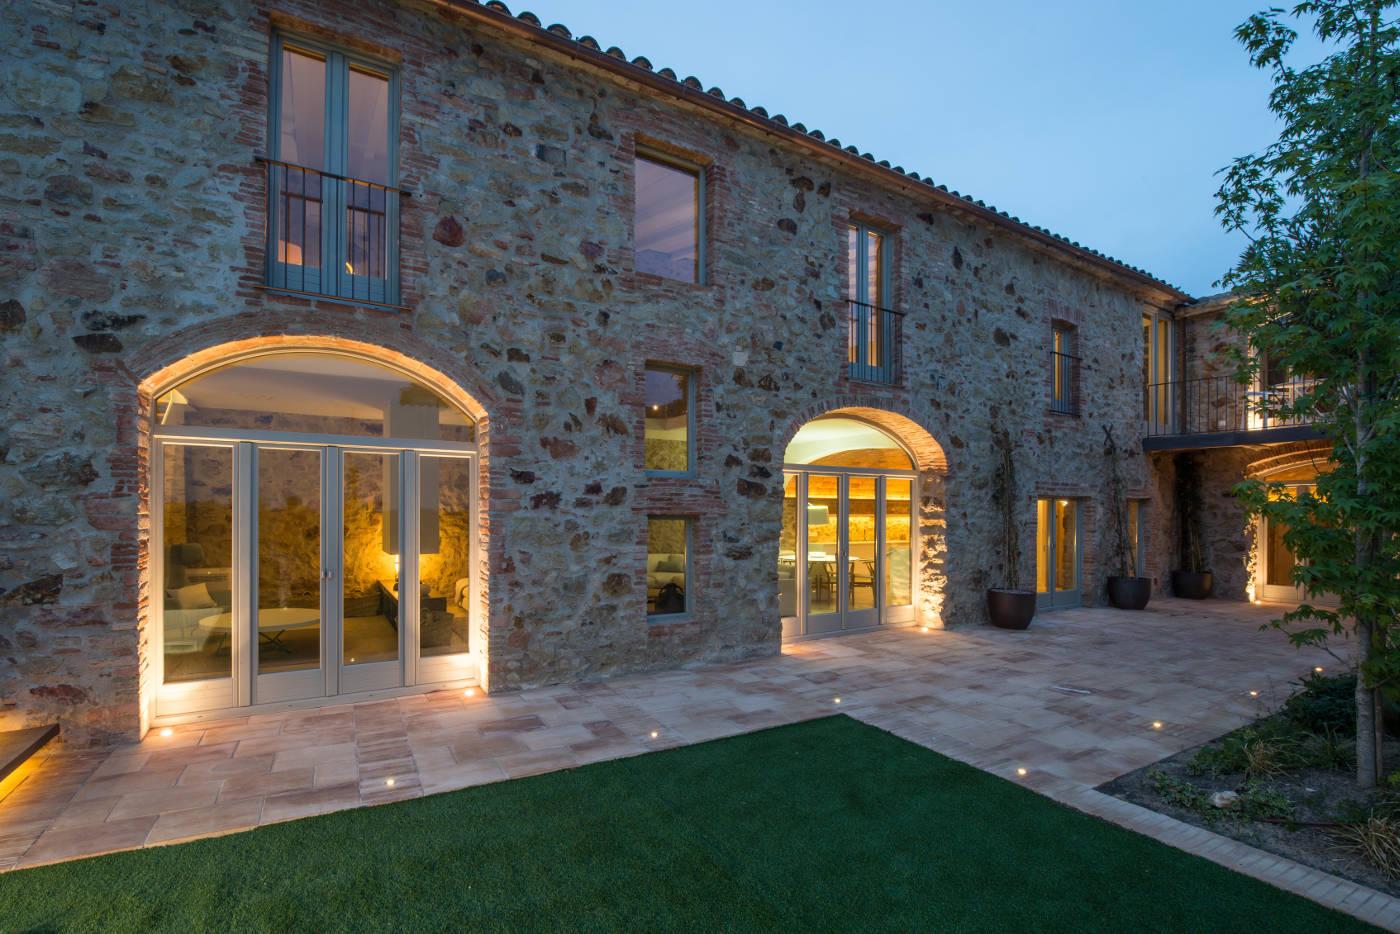 Reforma e interiorismo casa de pueblo pals gloria duran for Iluminacion exterior fachadas